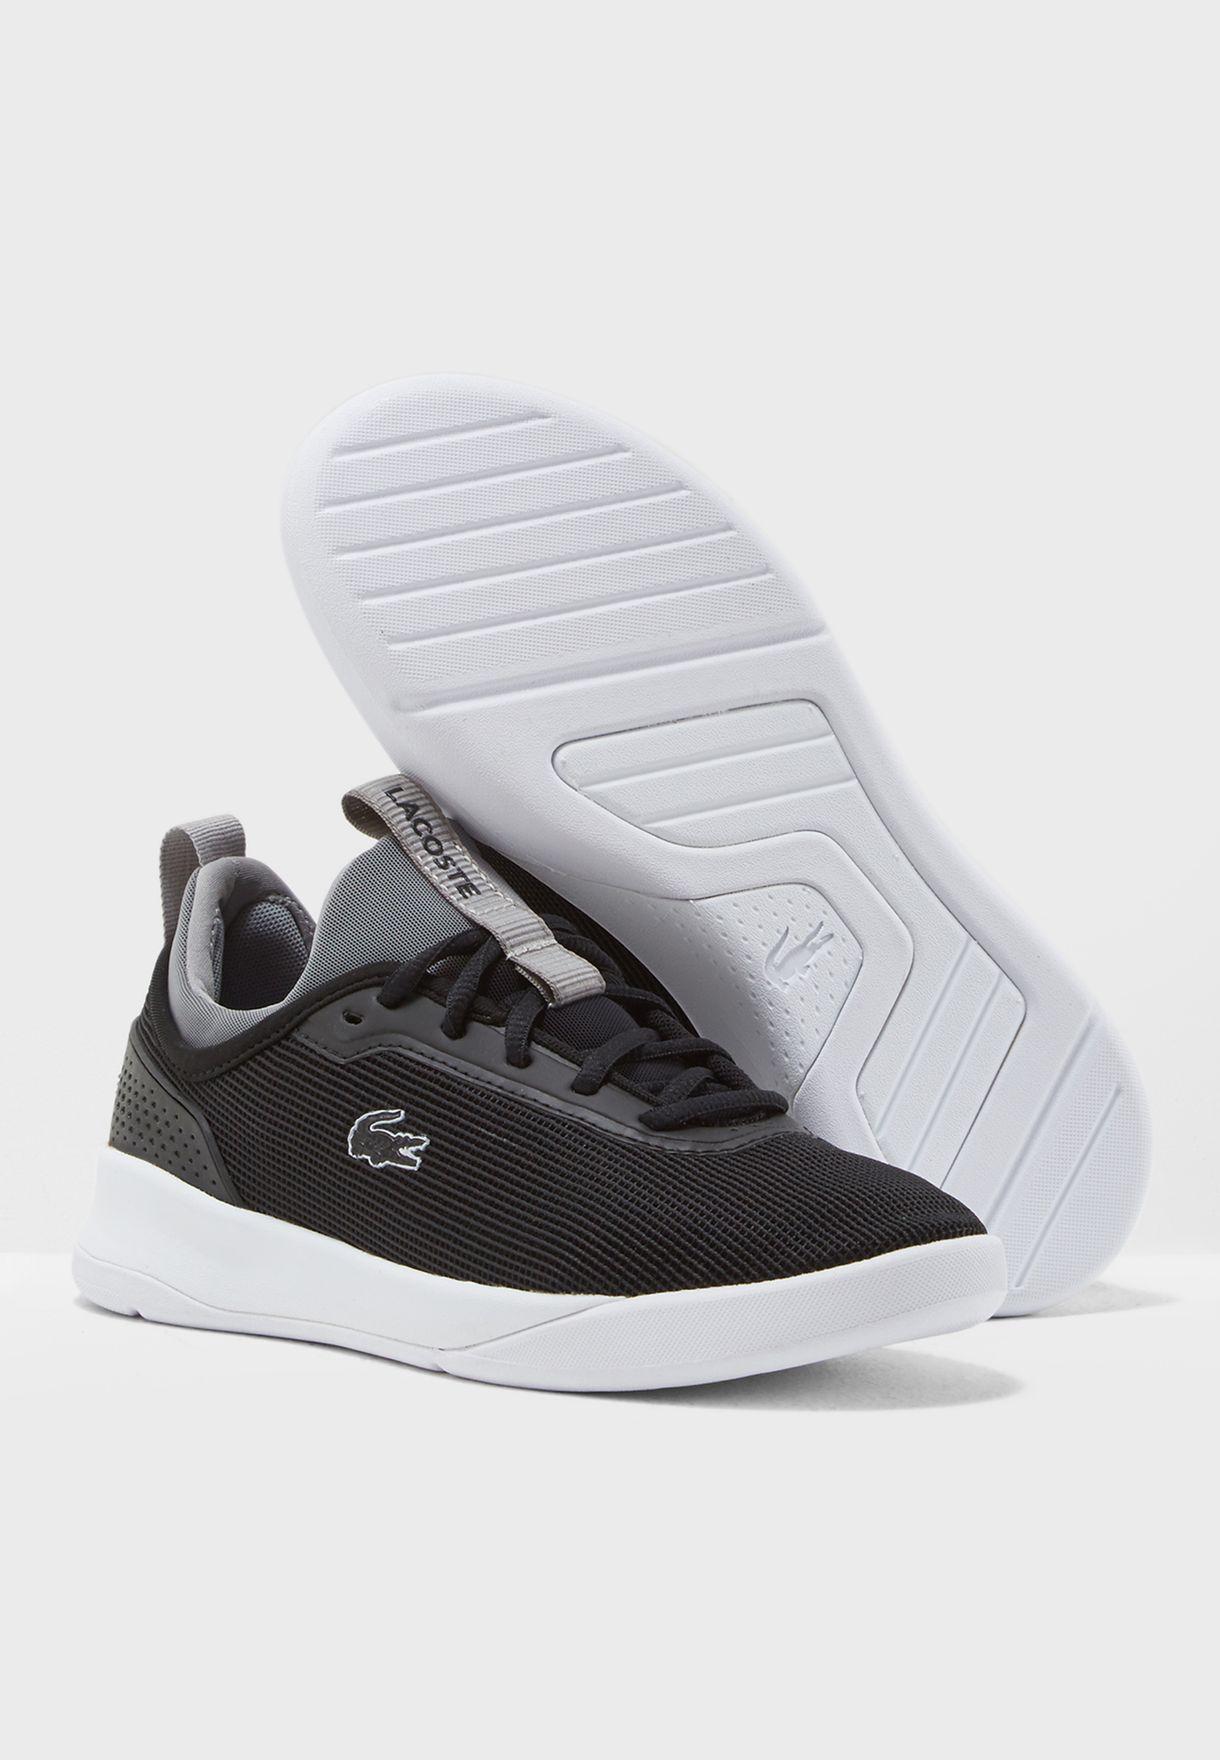 b7658f21a10b Shop Lacoste black Lt Spirit 2 318 2 Spw Sneaker 736SPW0038 for ...